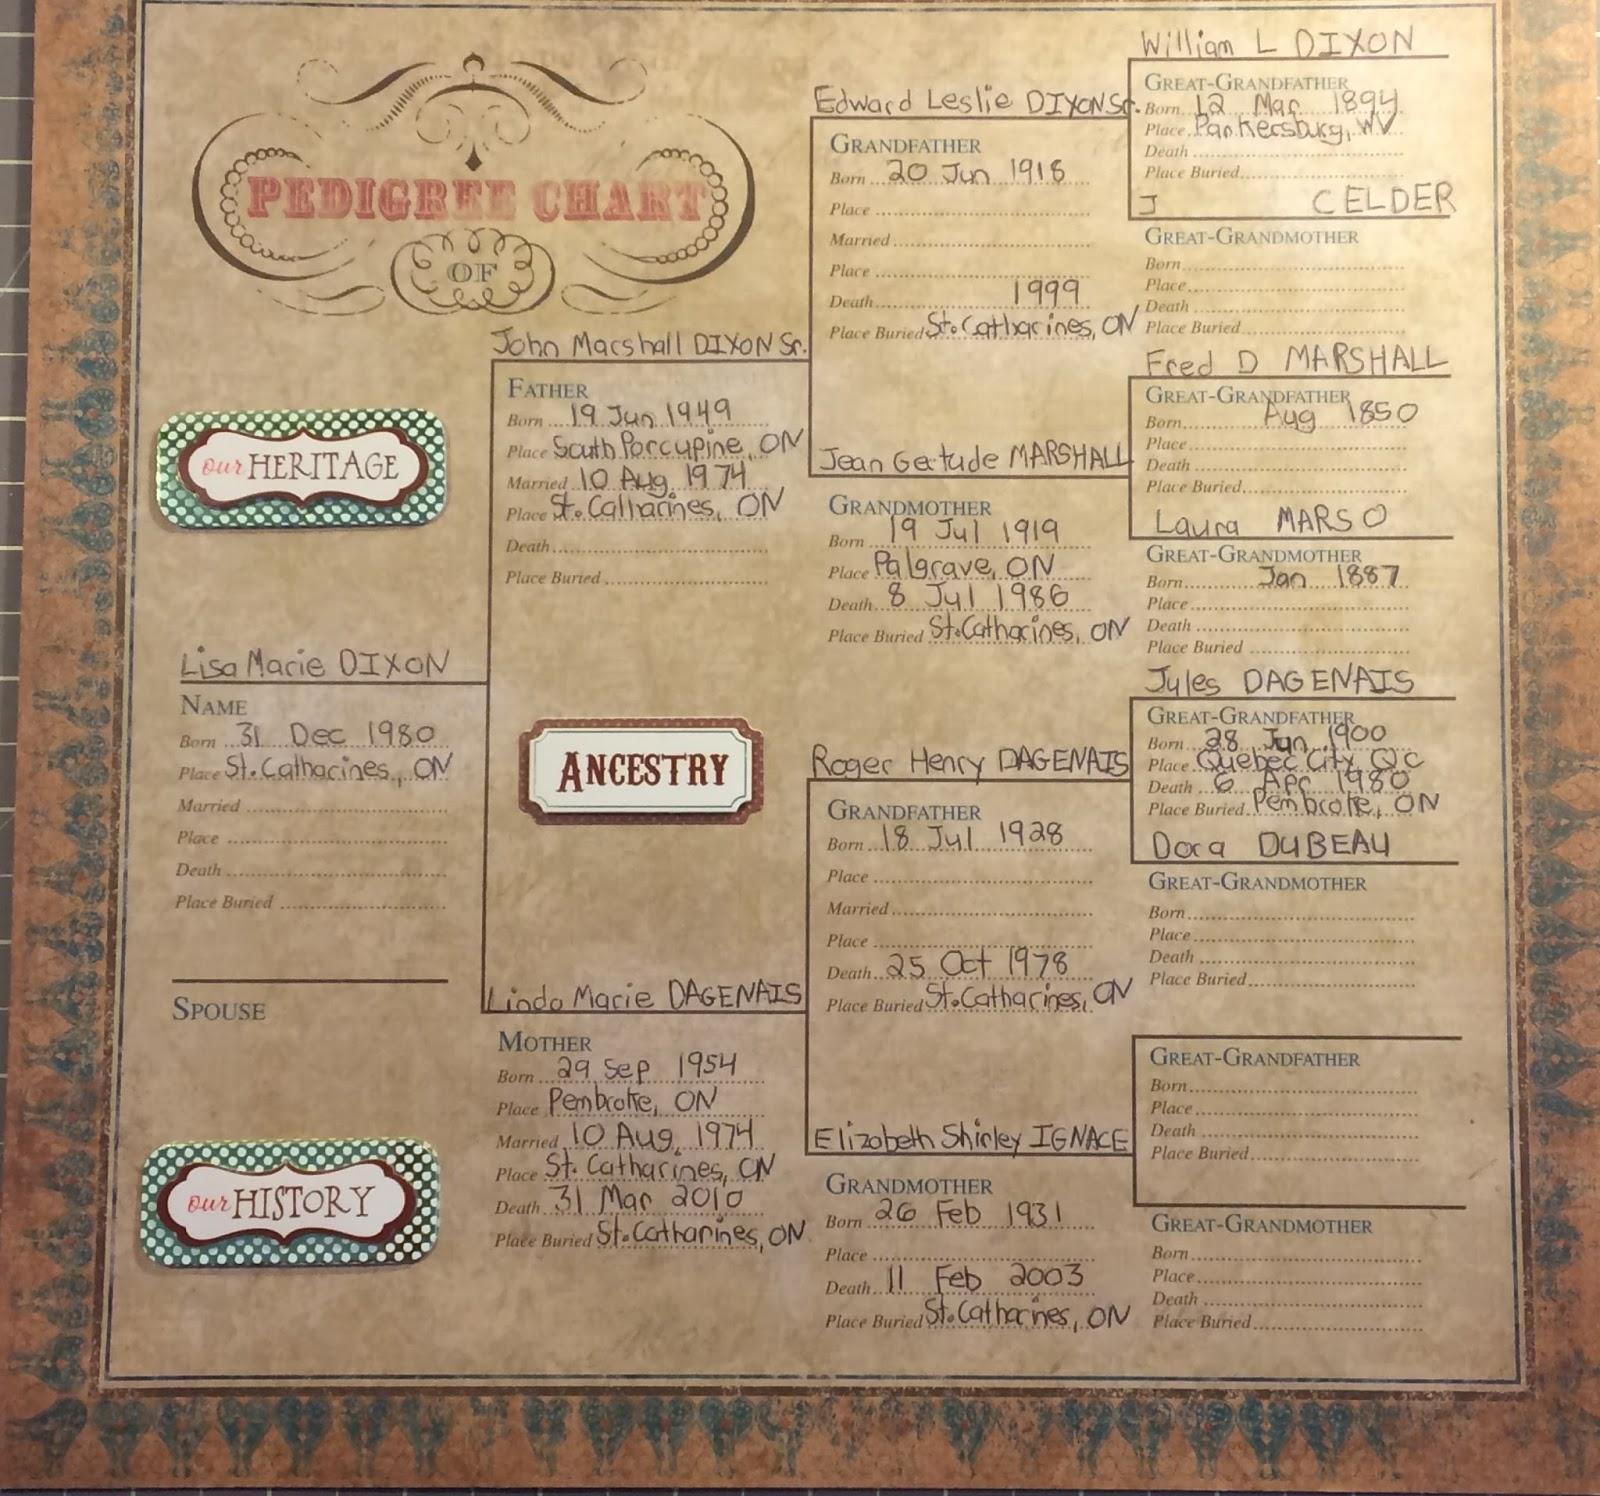 How to scrapbook family tree - Pedigree Chart